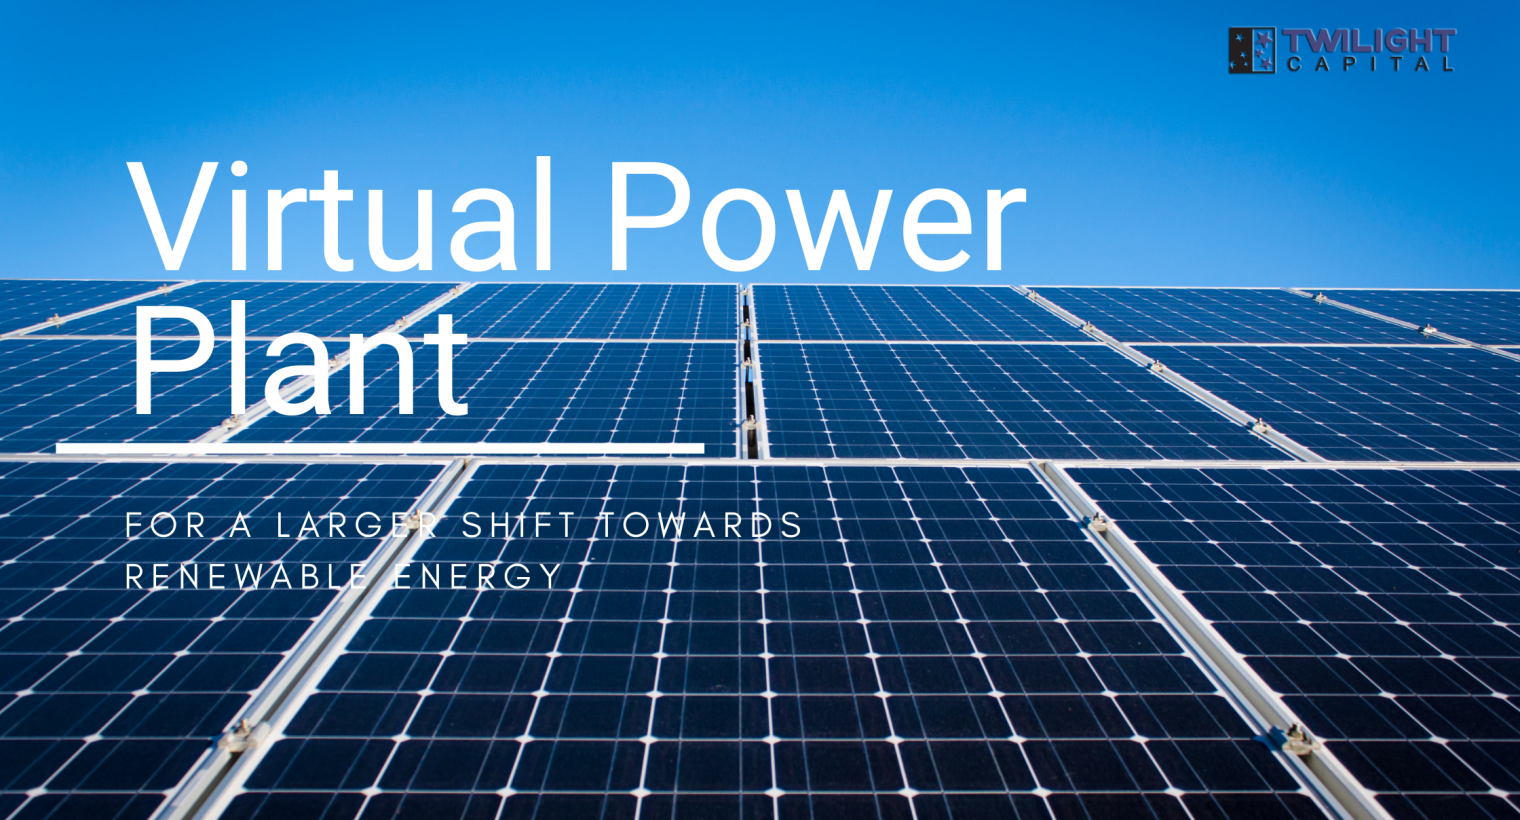 Virtual Power Plant Image Cover